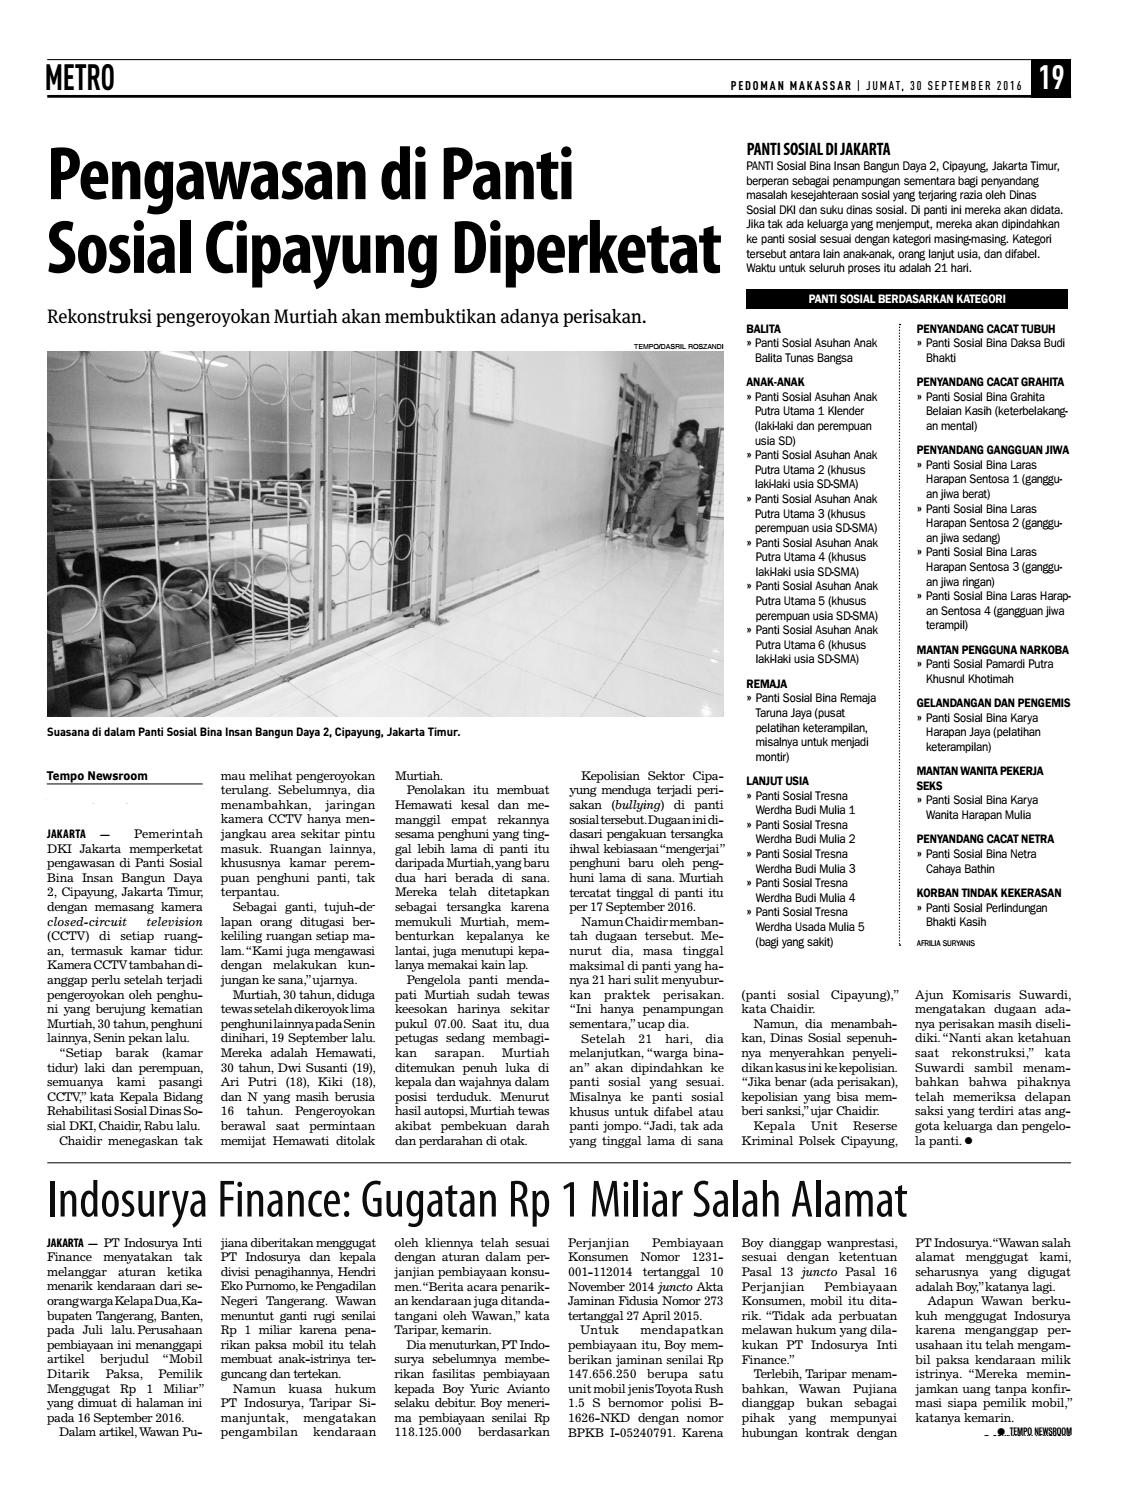 Edisi 59 30 September 2016 Pedoman Makassar By Indoaurya Life 3 Jiwa Issuu